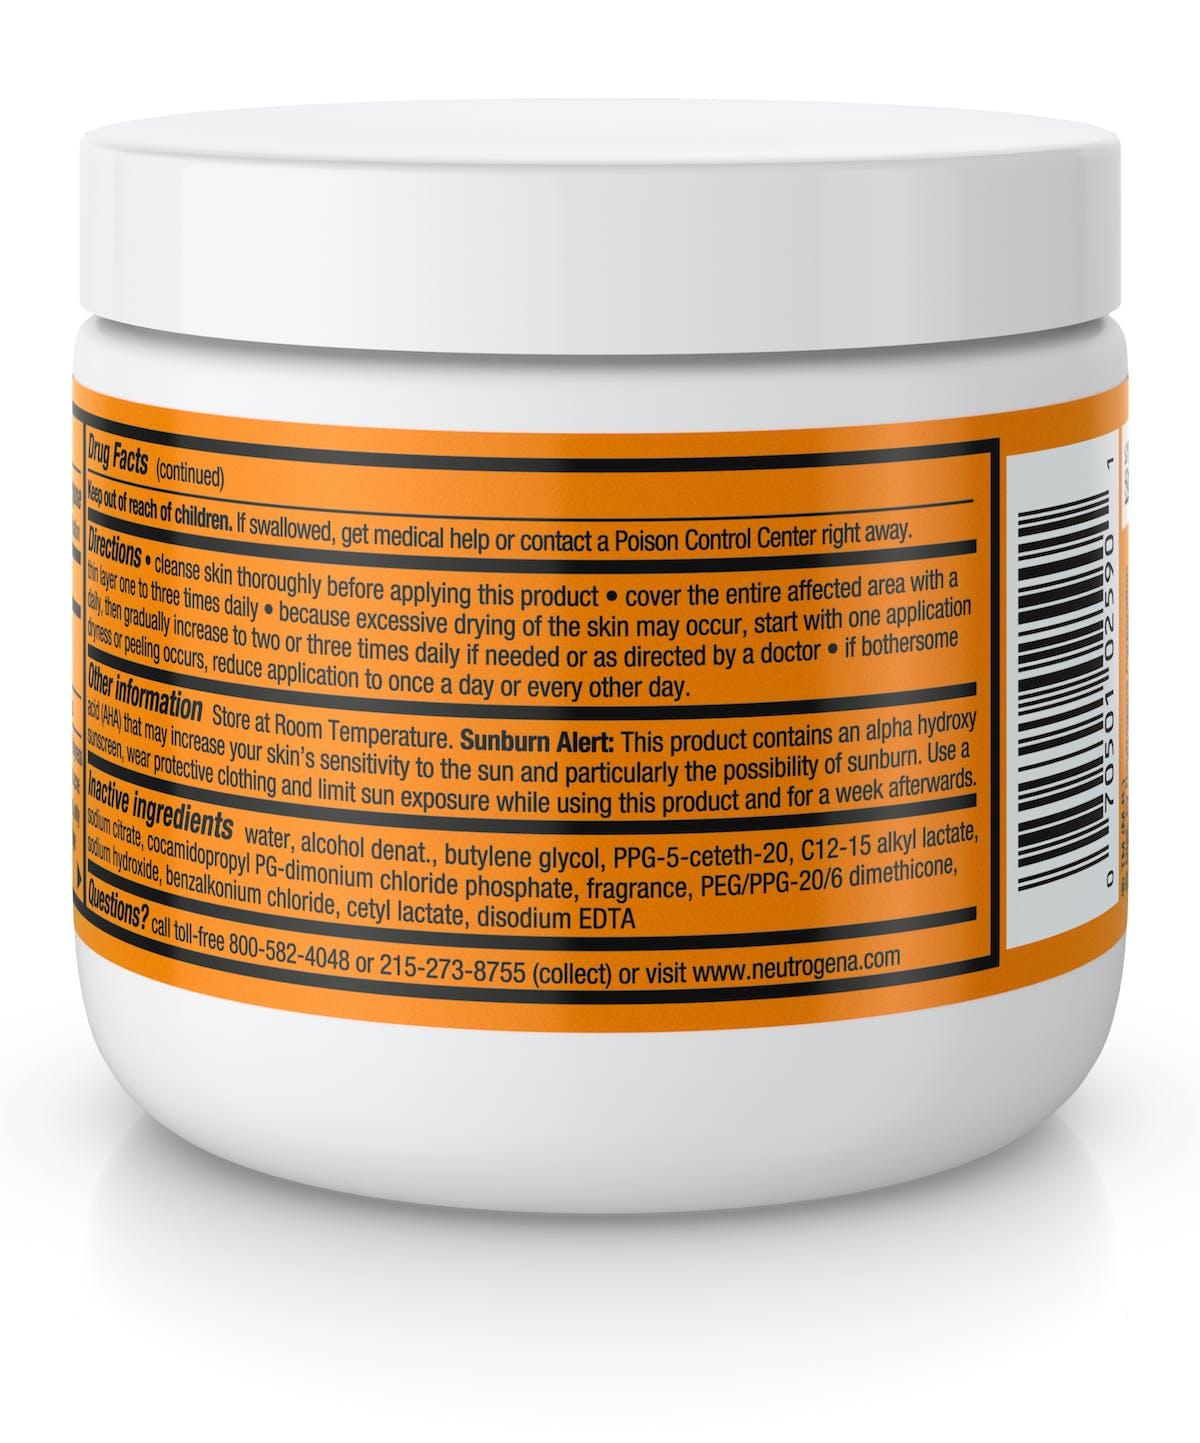 Neutrogena Rapid Clear® Treatment Pads | Neutrogena®